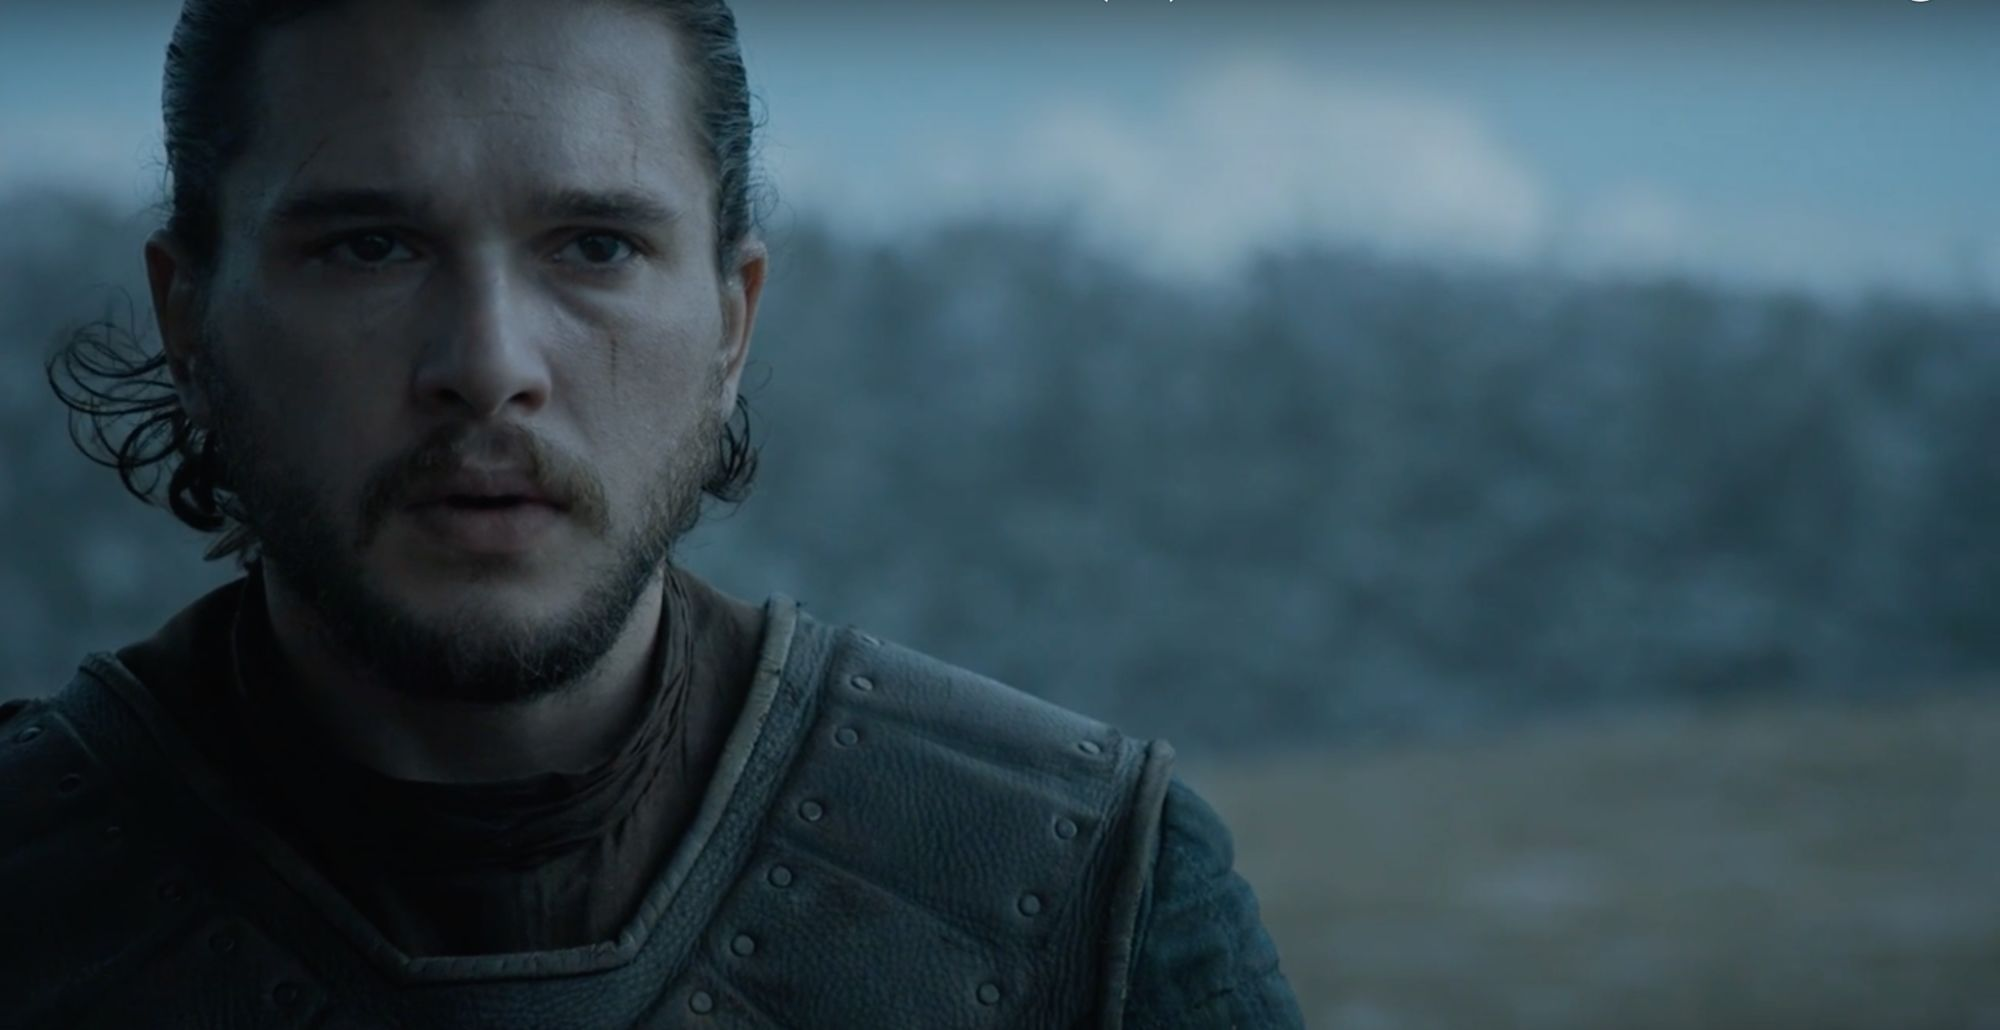 game of thrones season 6 episode 9 summary